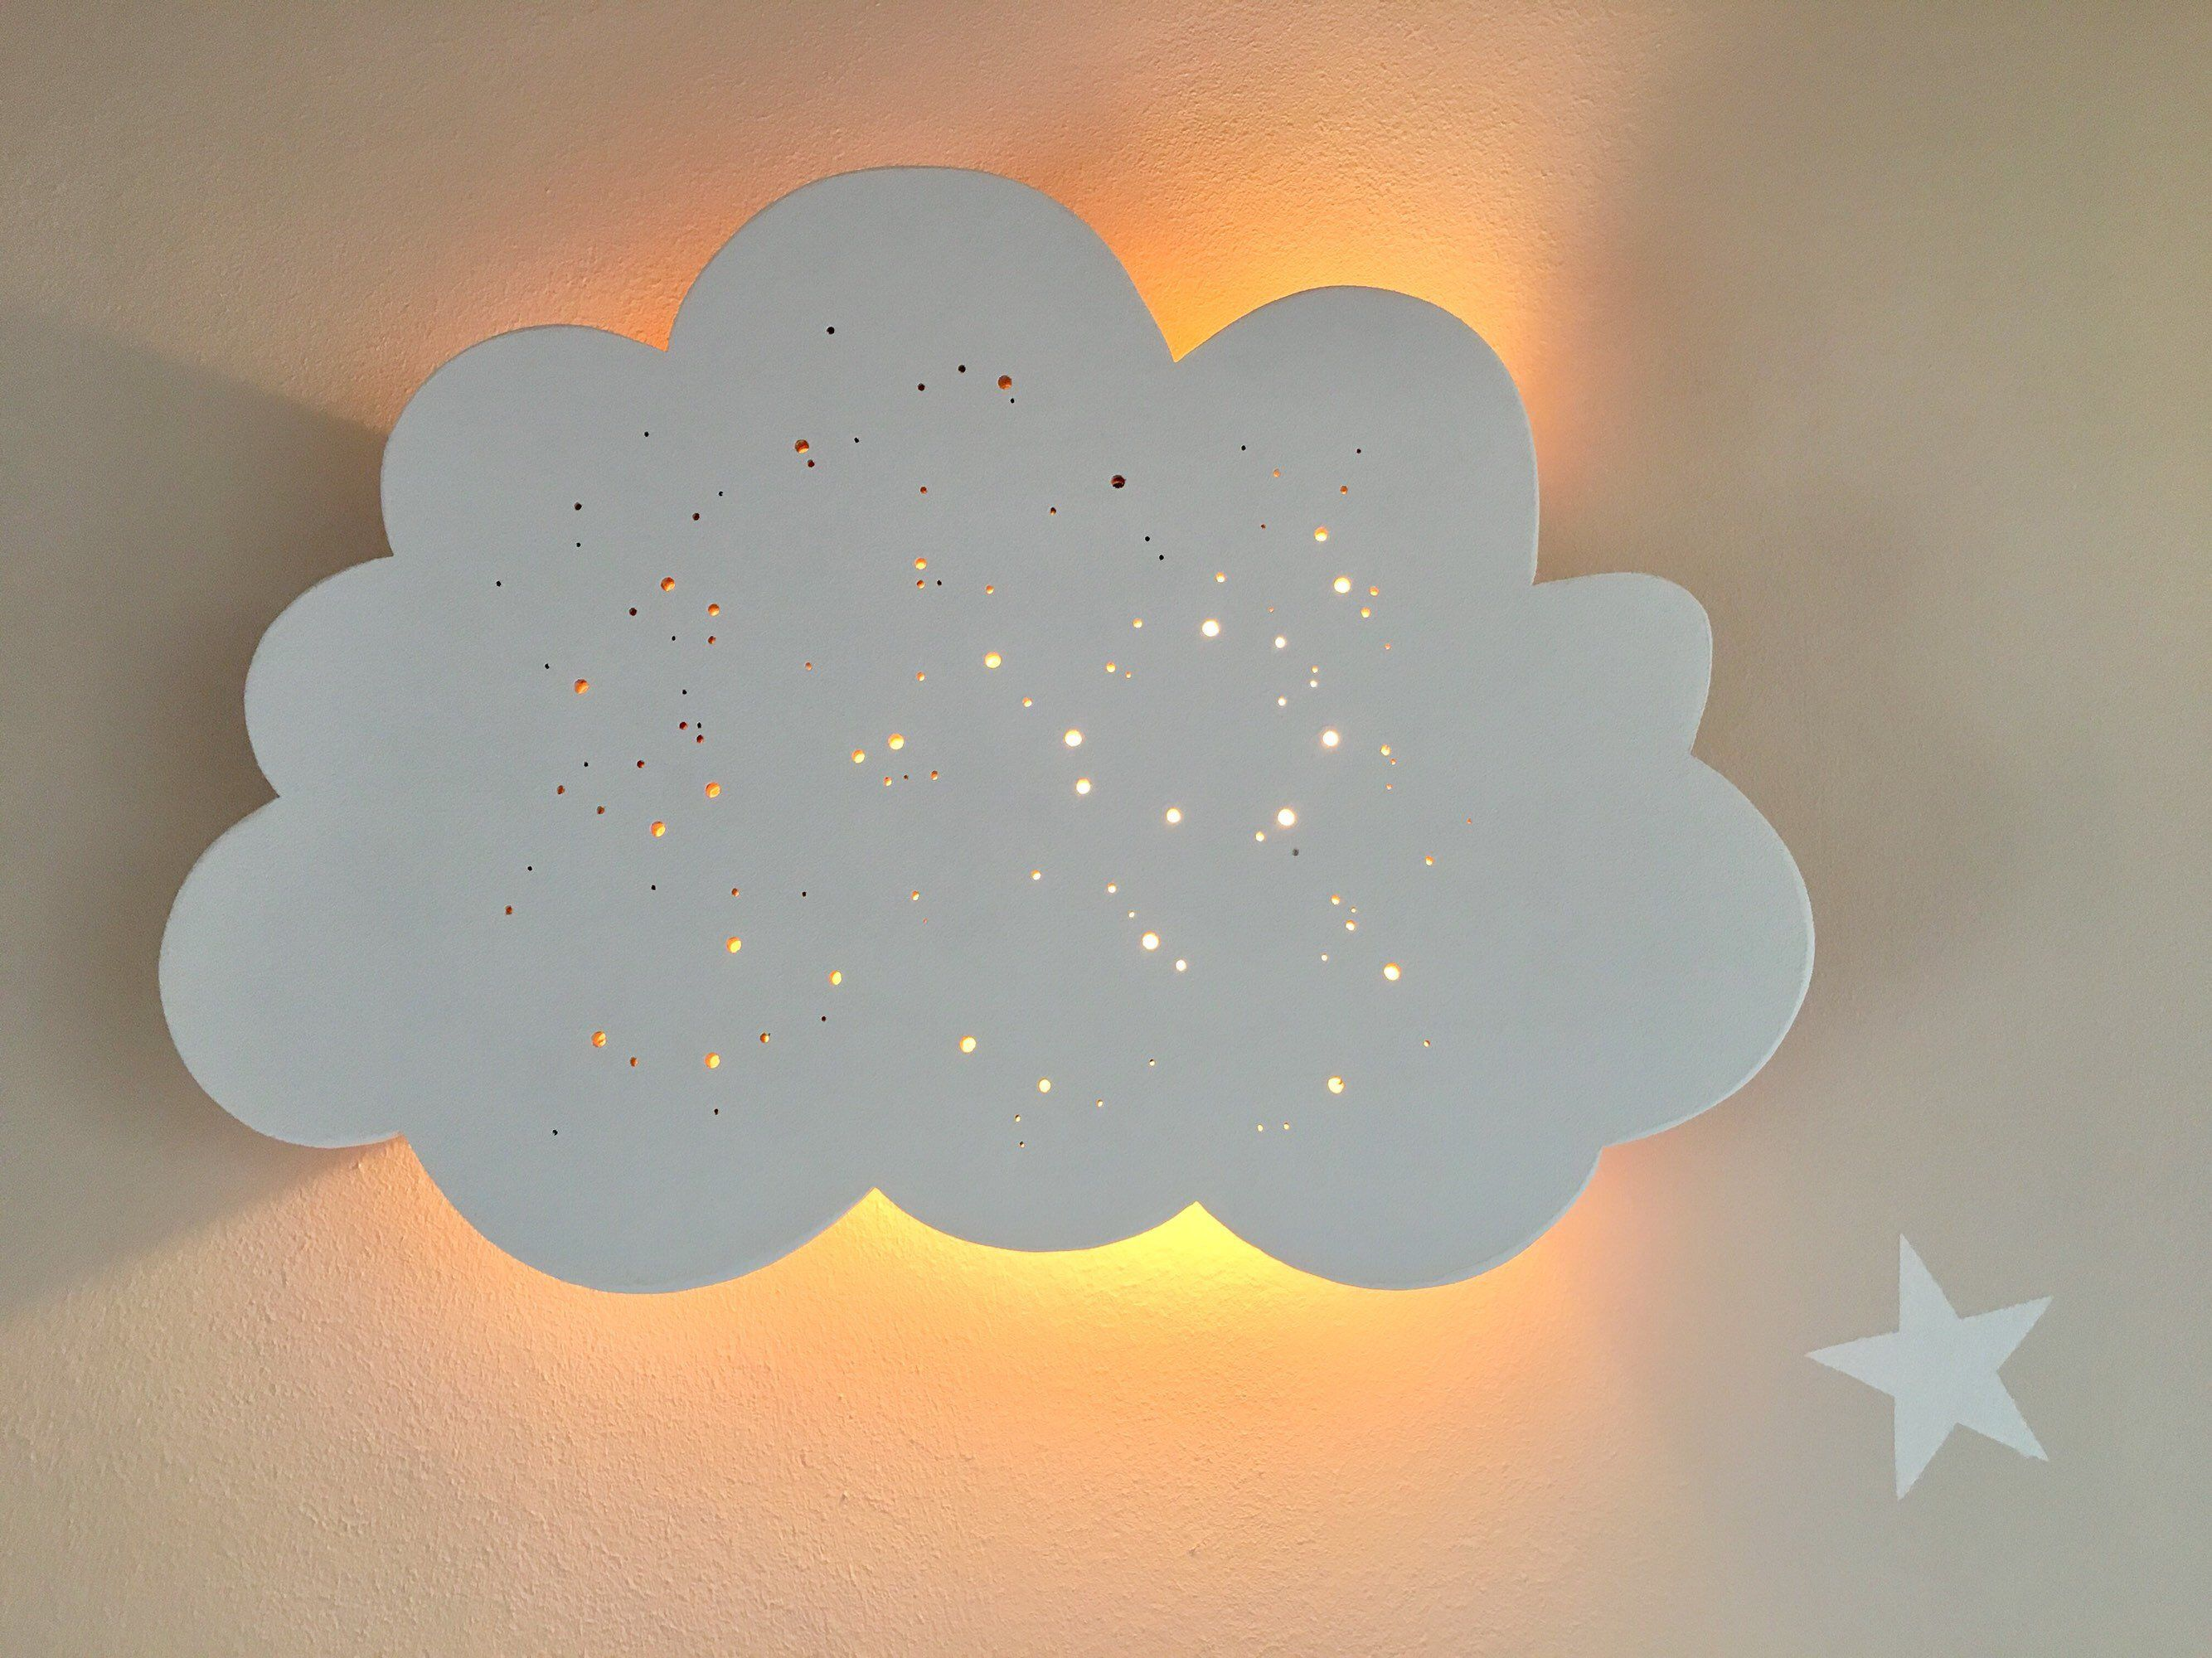 Kinderlampe Wandlampe Wandleuchte Wolkenlampe Holzlampe Etsy Wolkenlampe Nachtleuchte Kinder Lampen